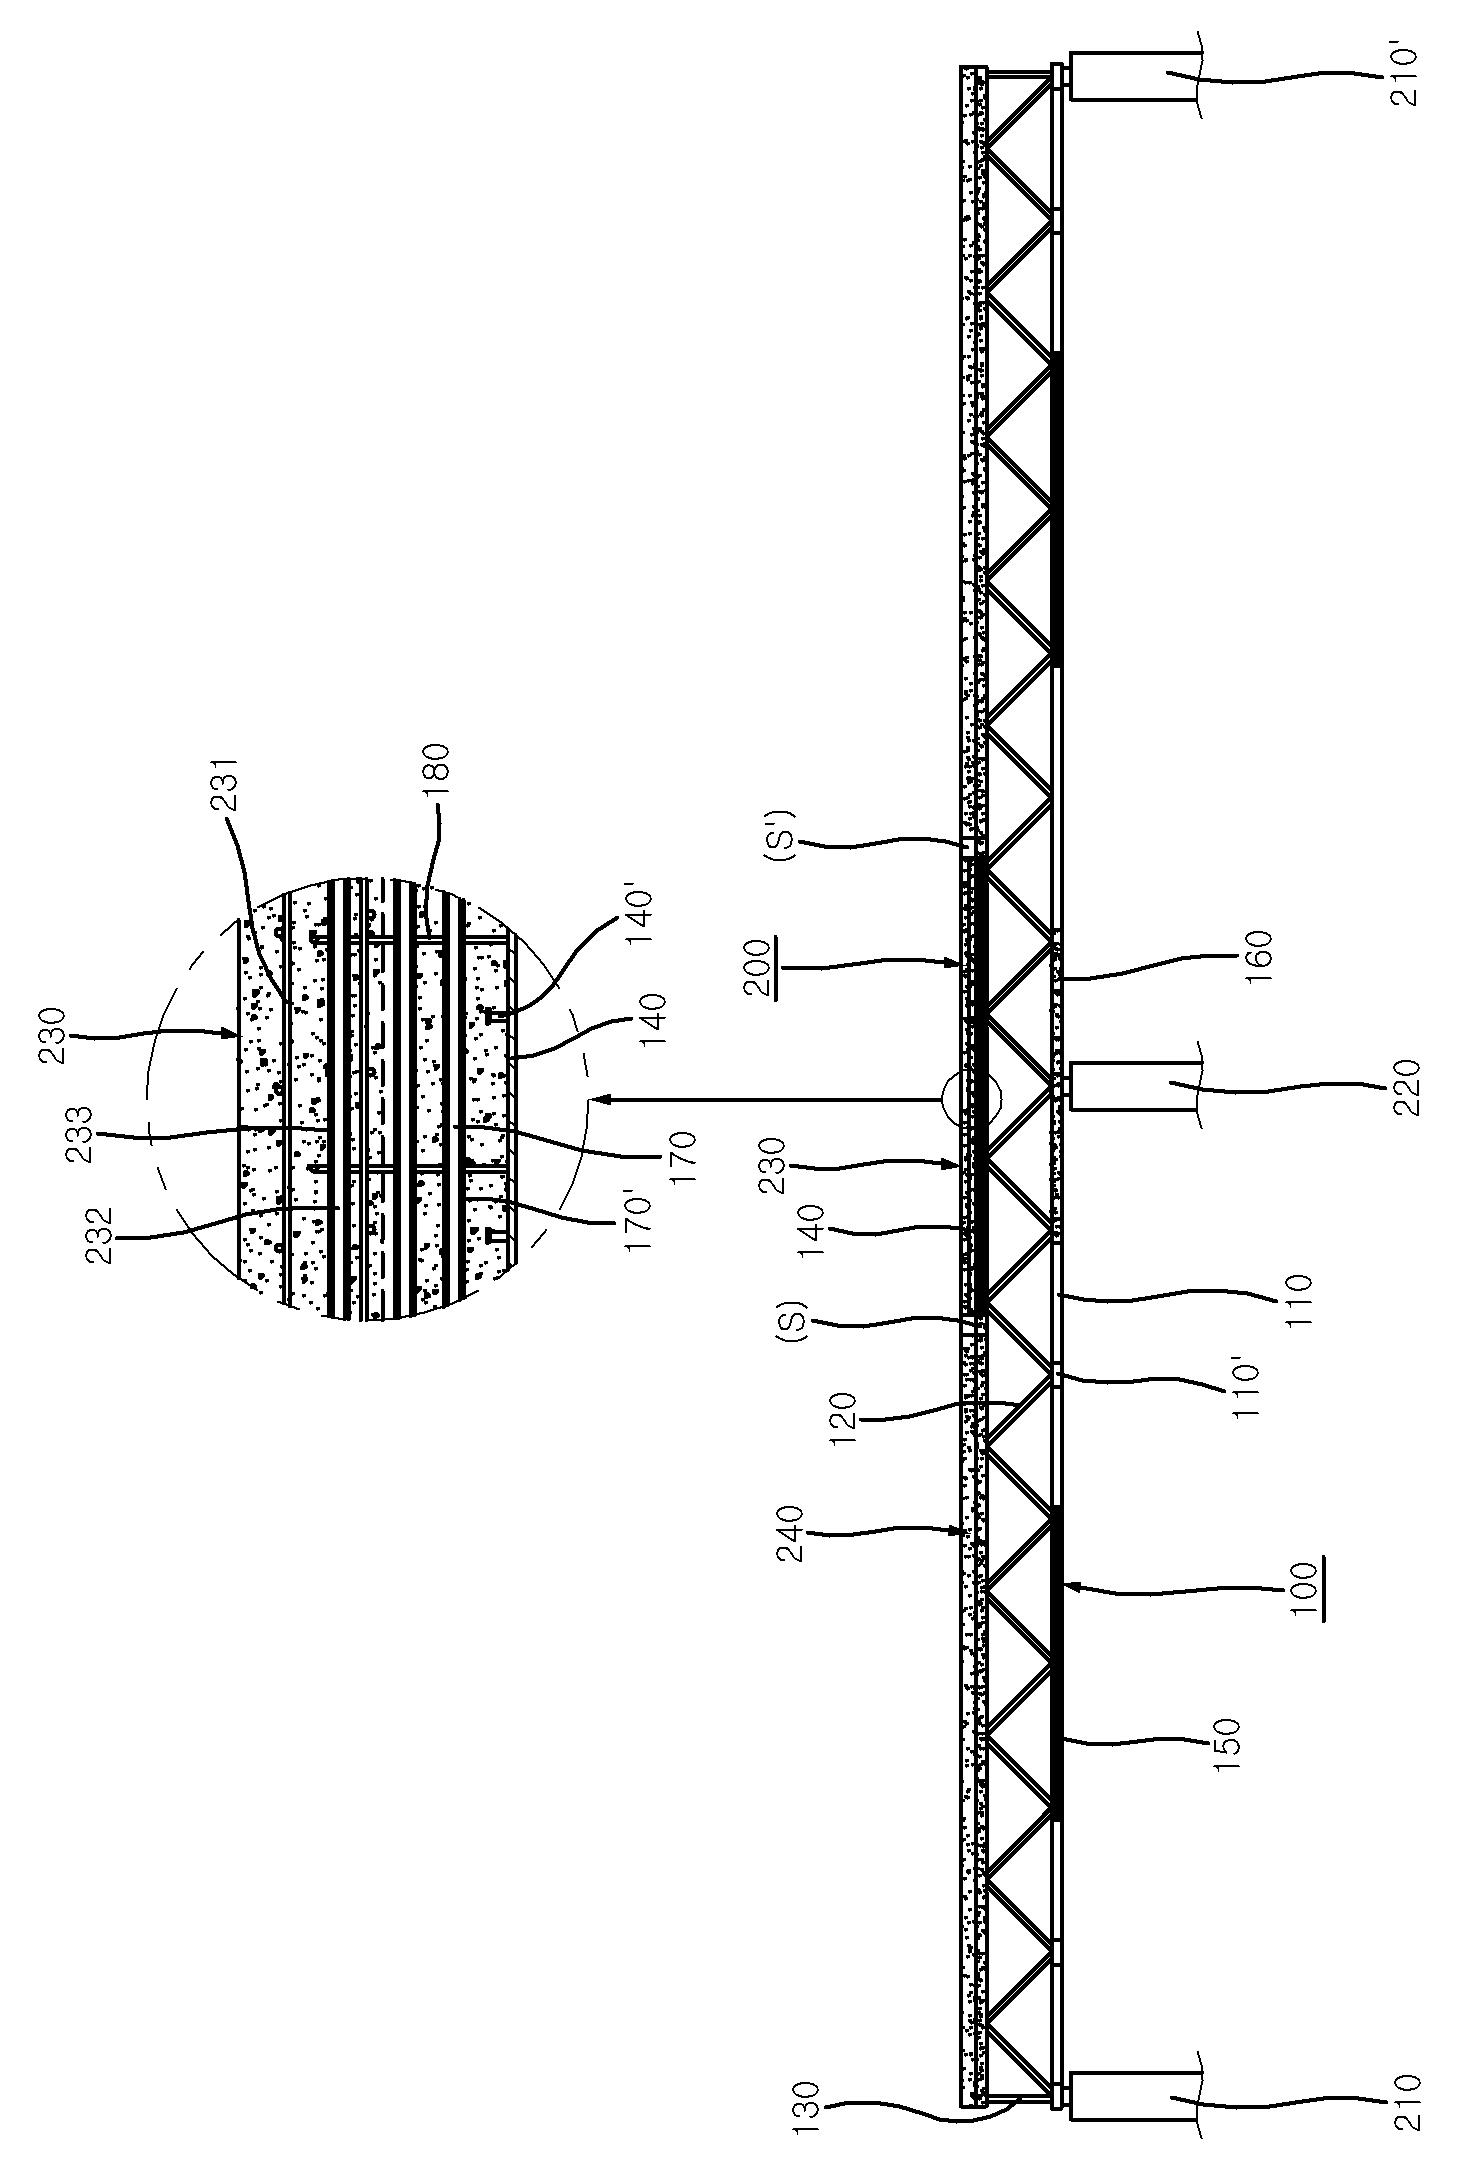 patent wo2012044013a2